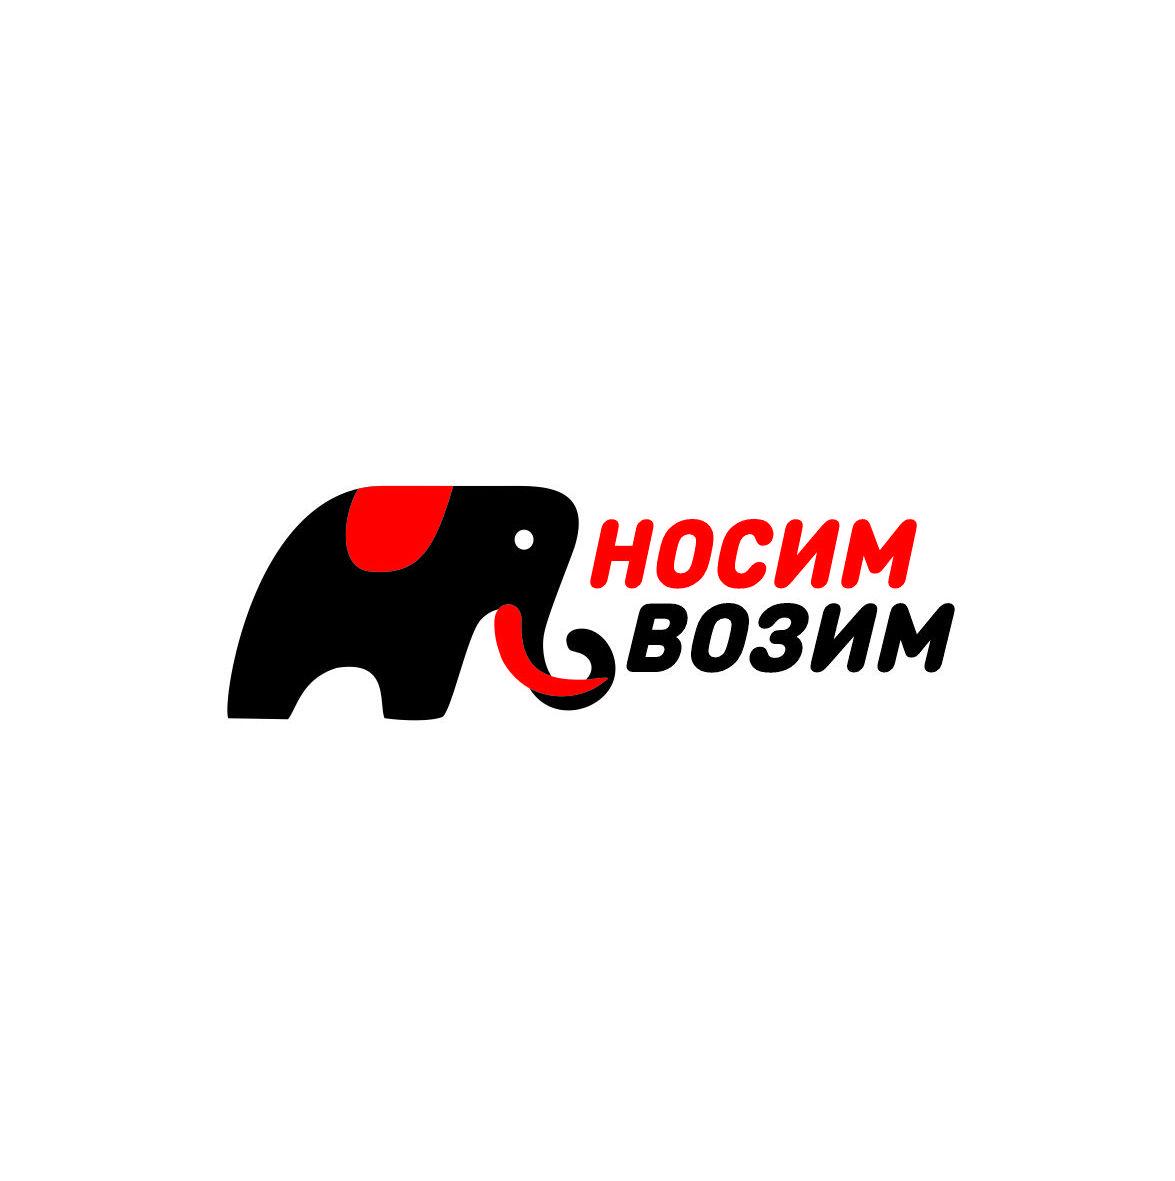 Логотип компании по перевозкам НосимВозим фото f_0585cf721429c55c.jpg